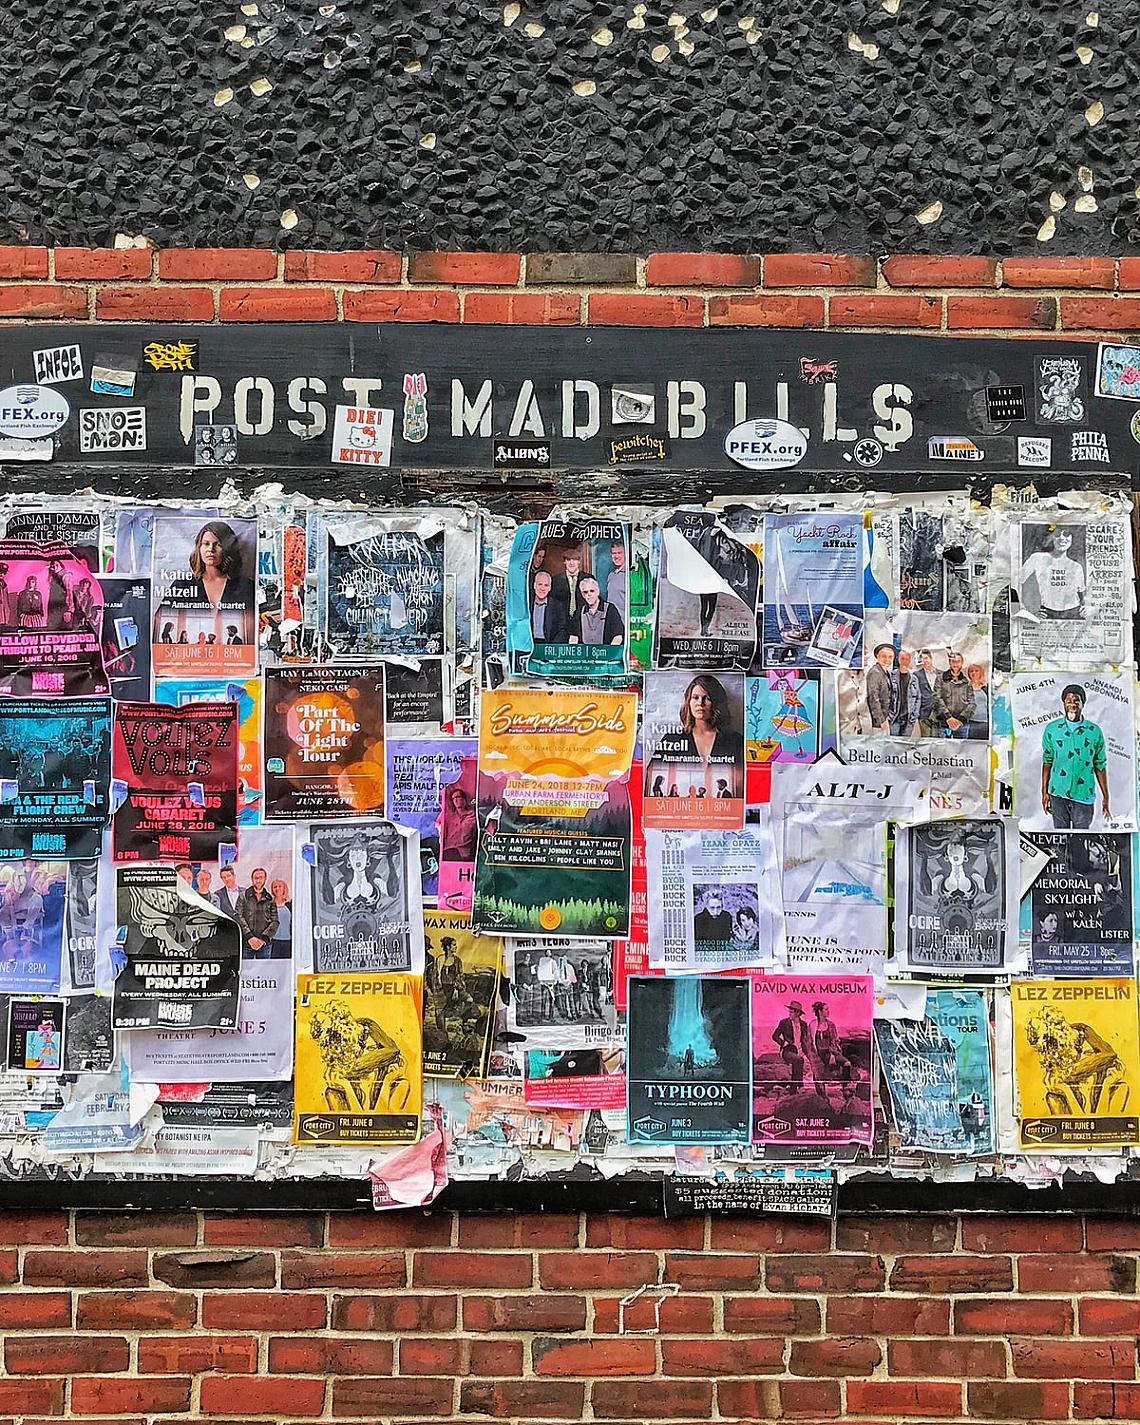 Post Mad Bills show board in Portland, Maine.